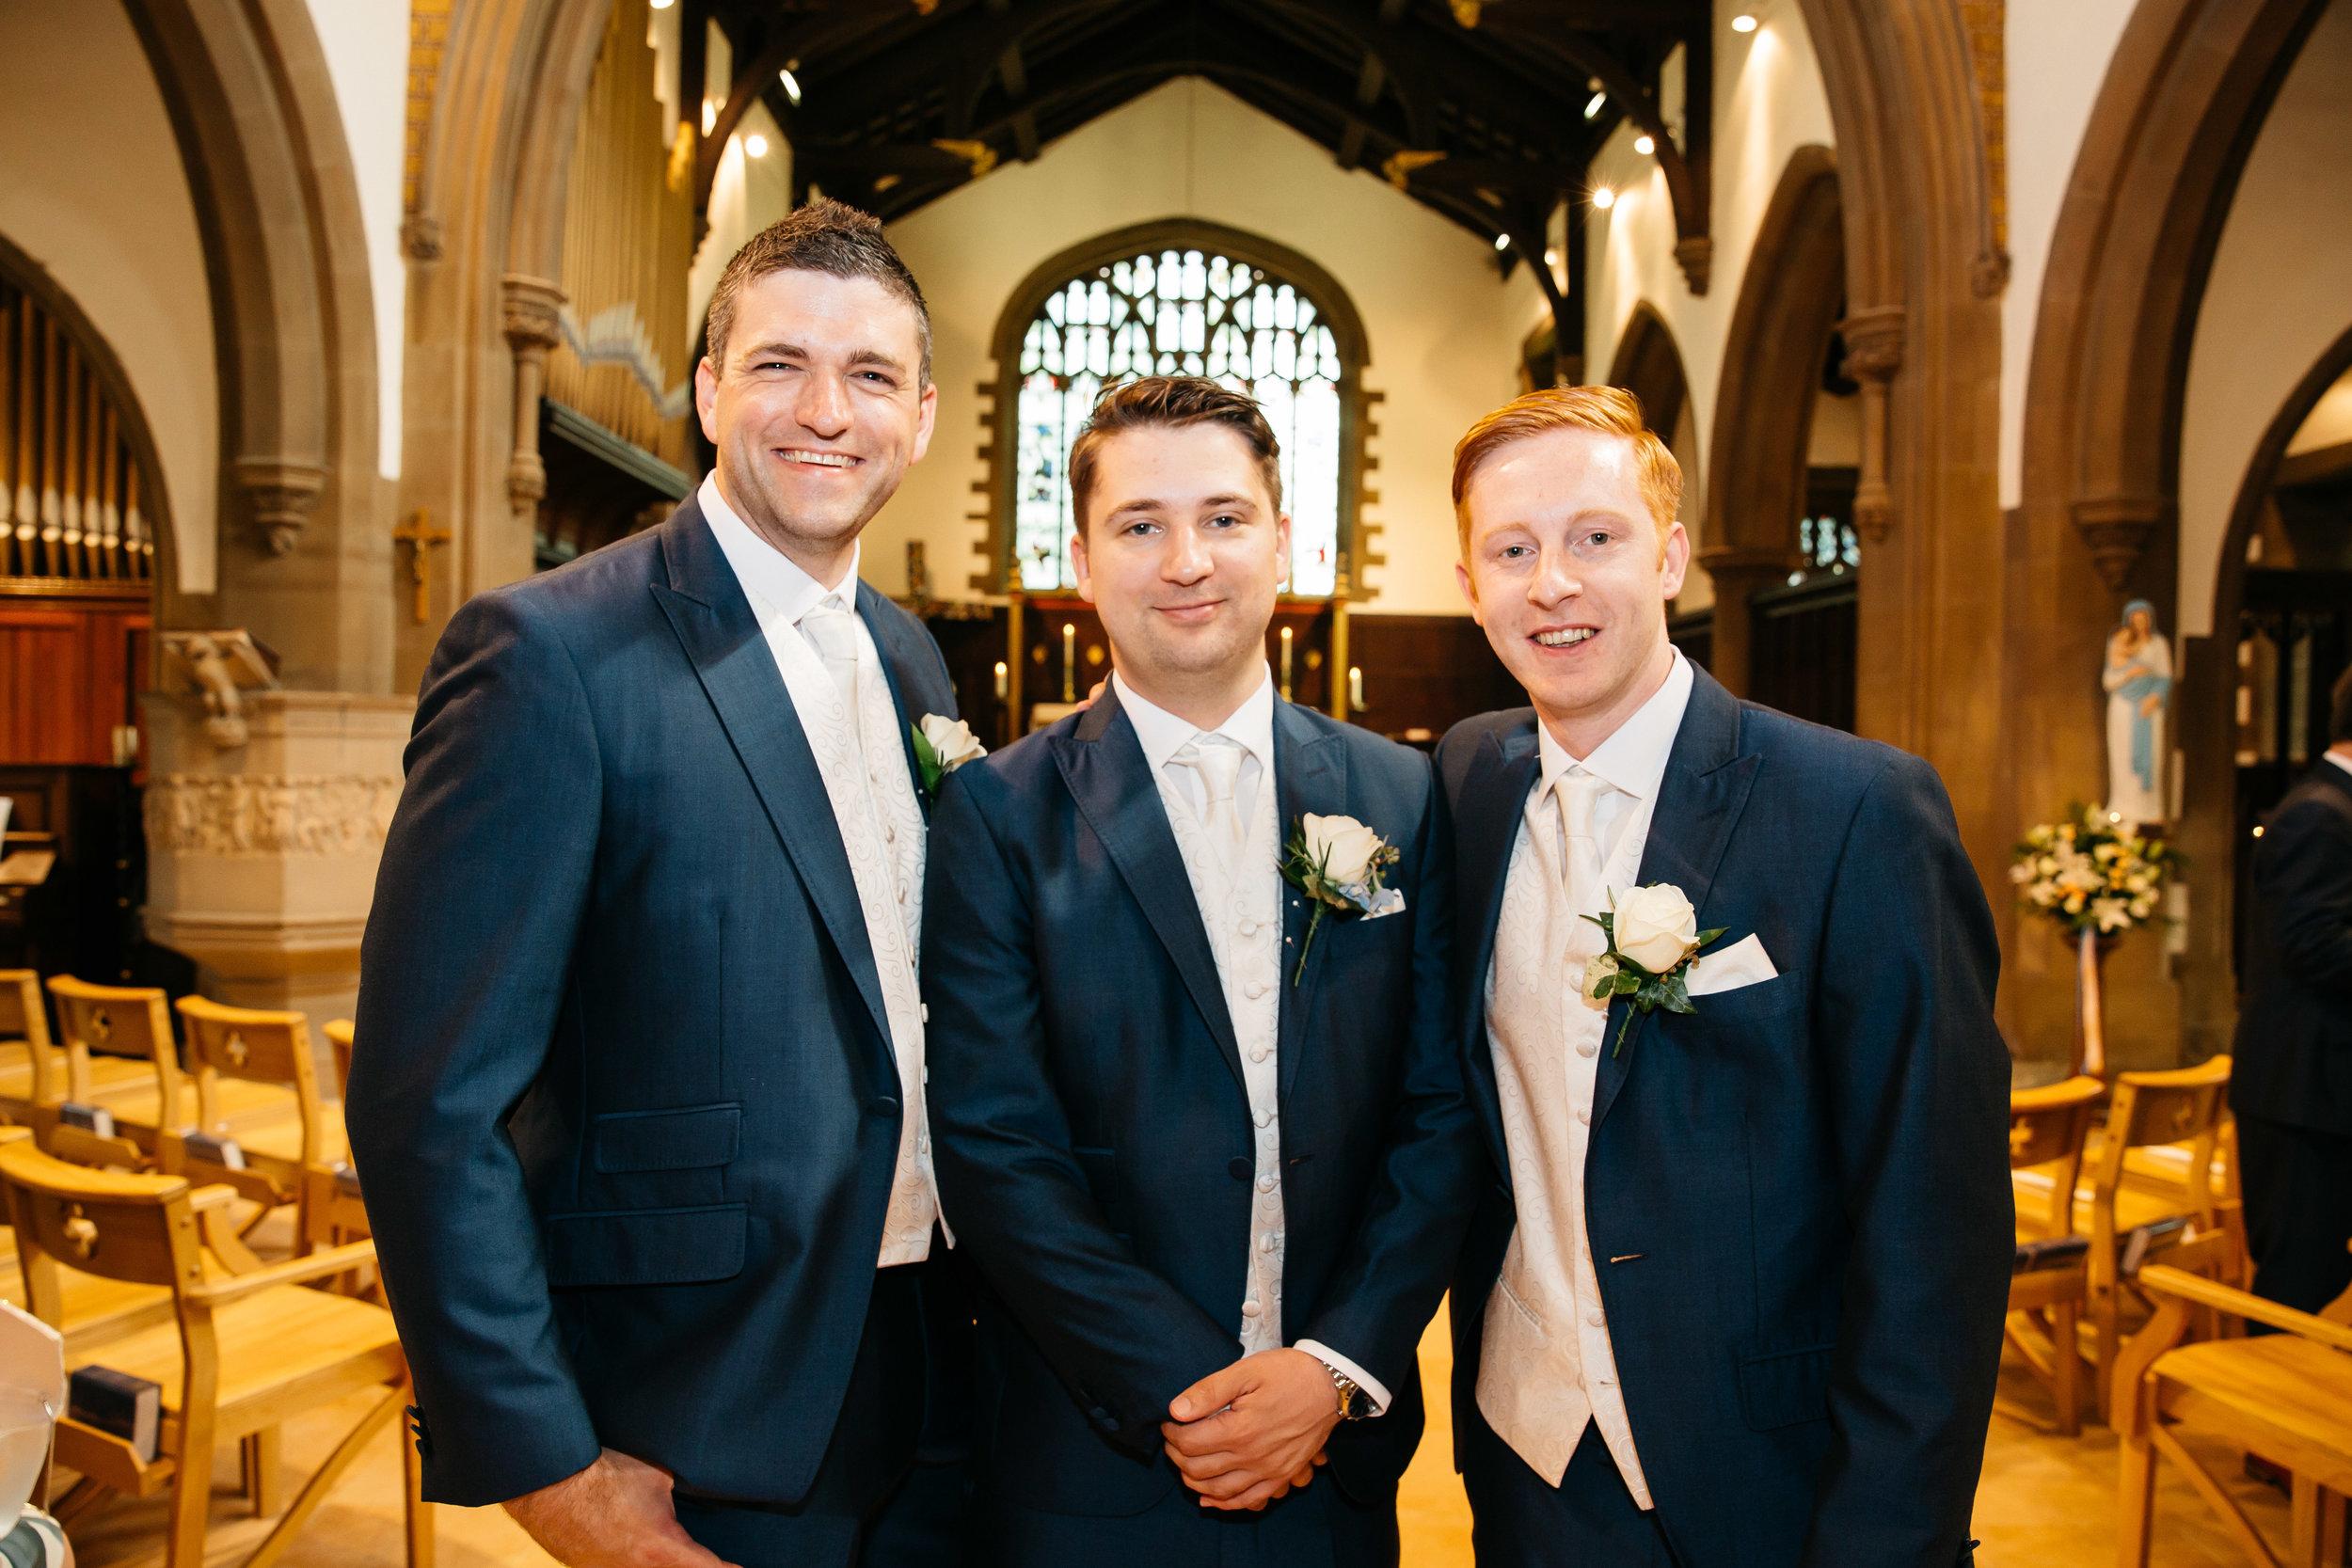 Groom and Best Men at church Leeds